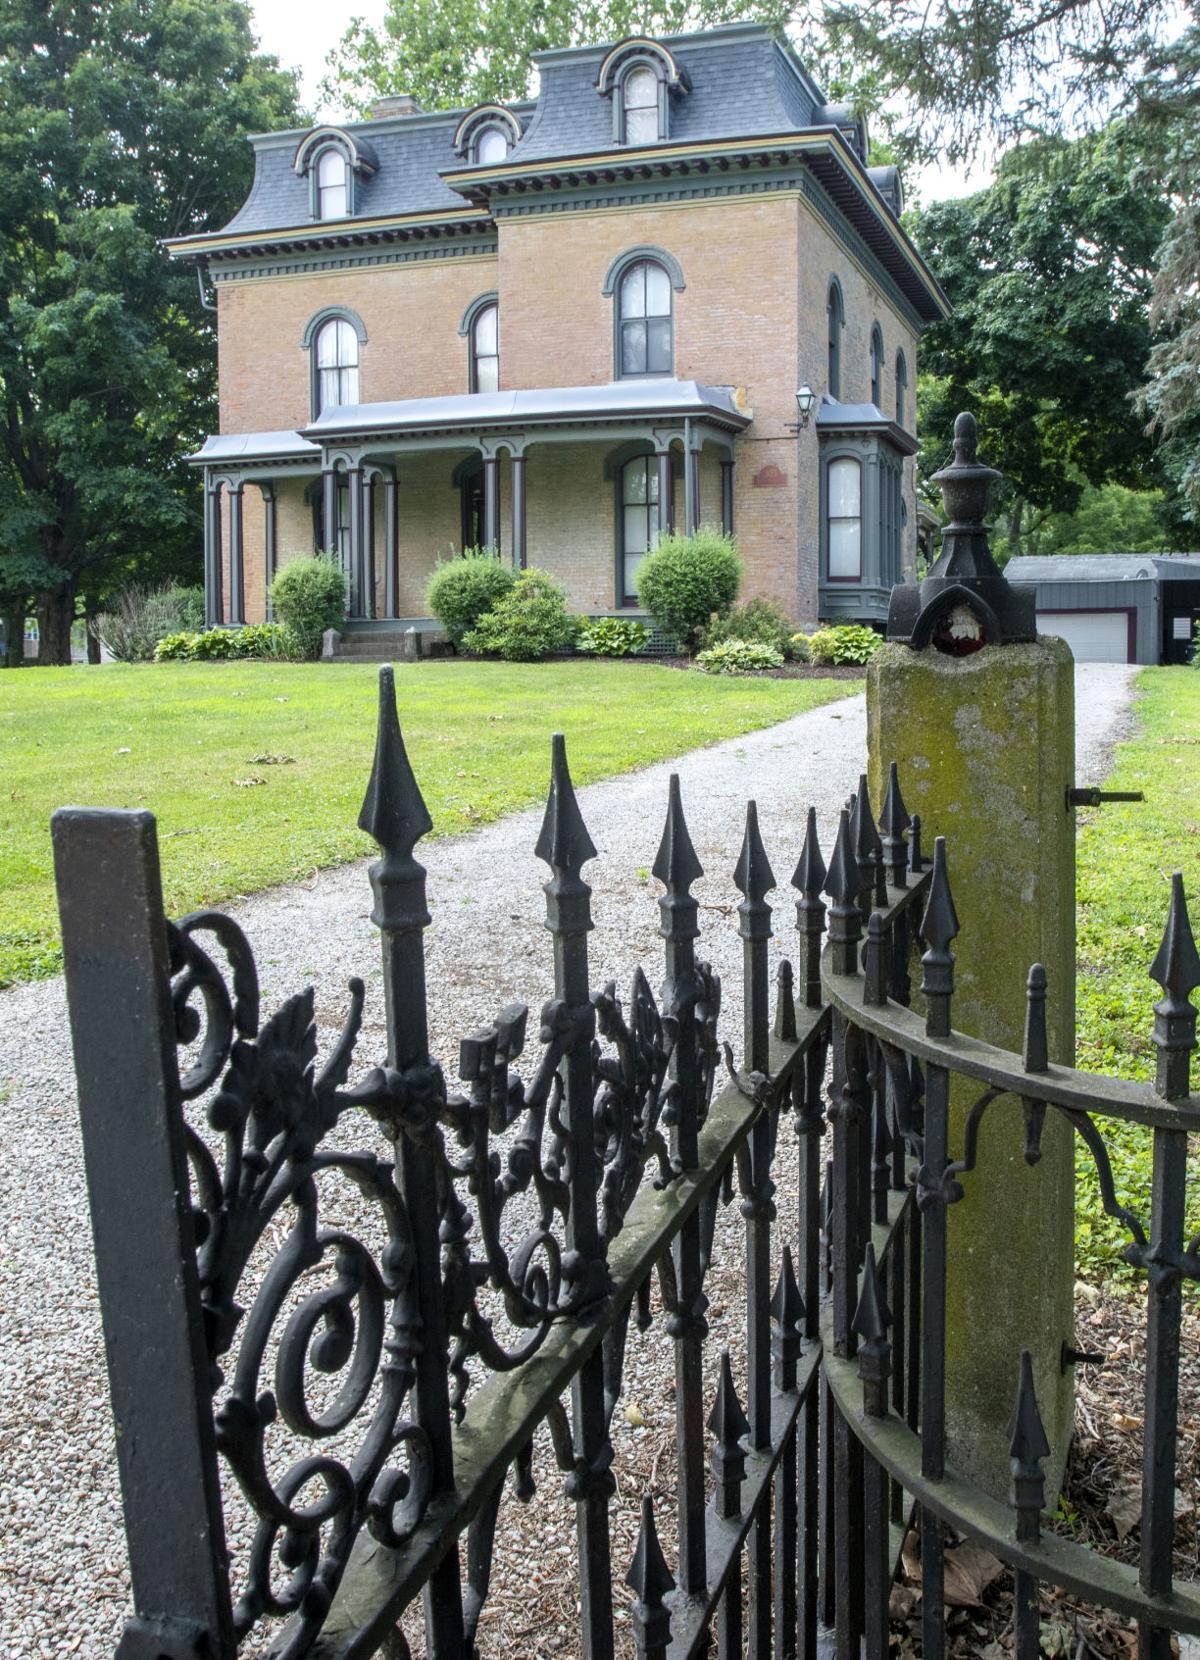 Meharry-Dowell House